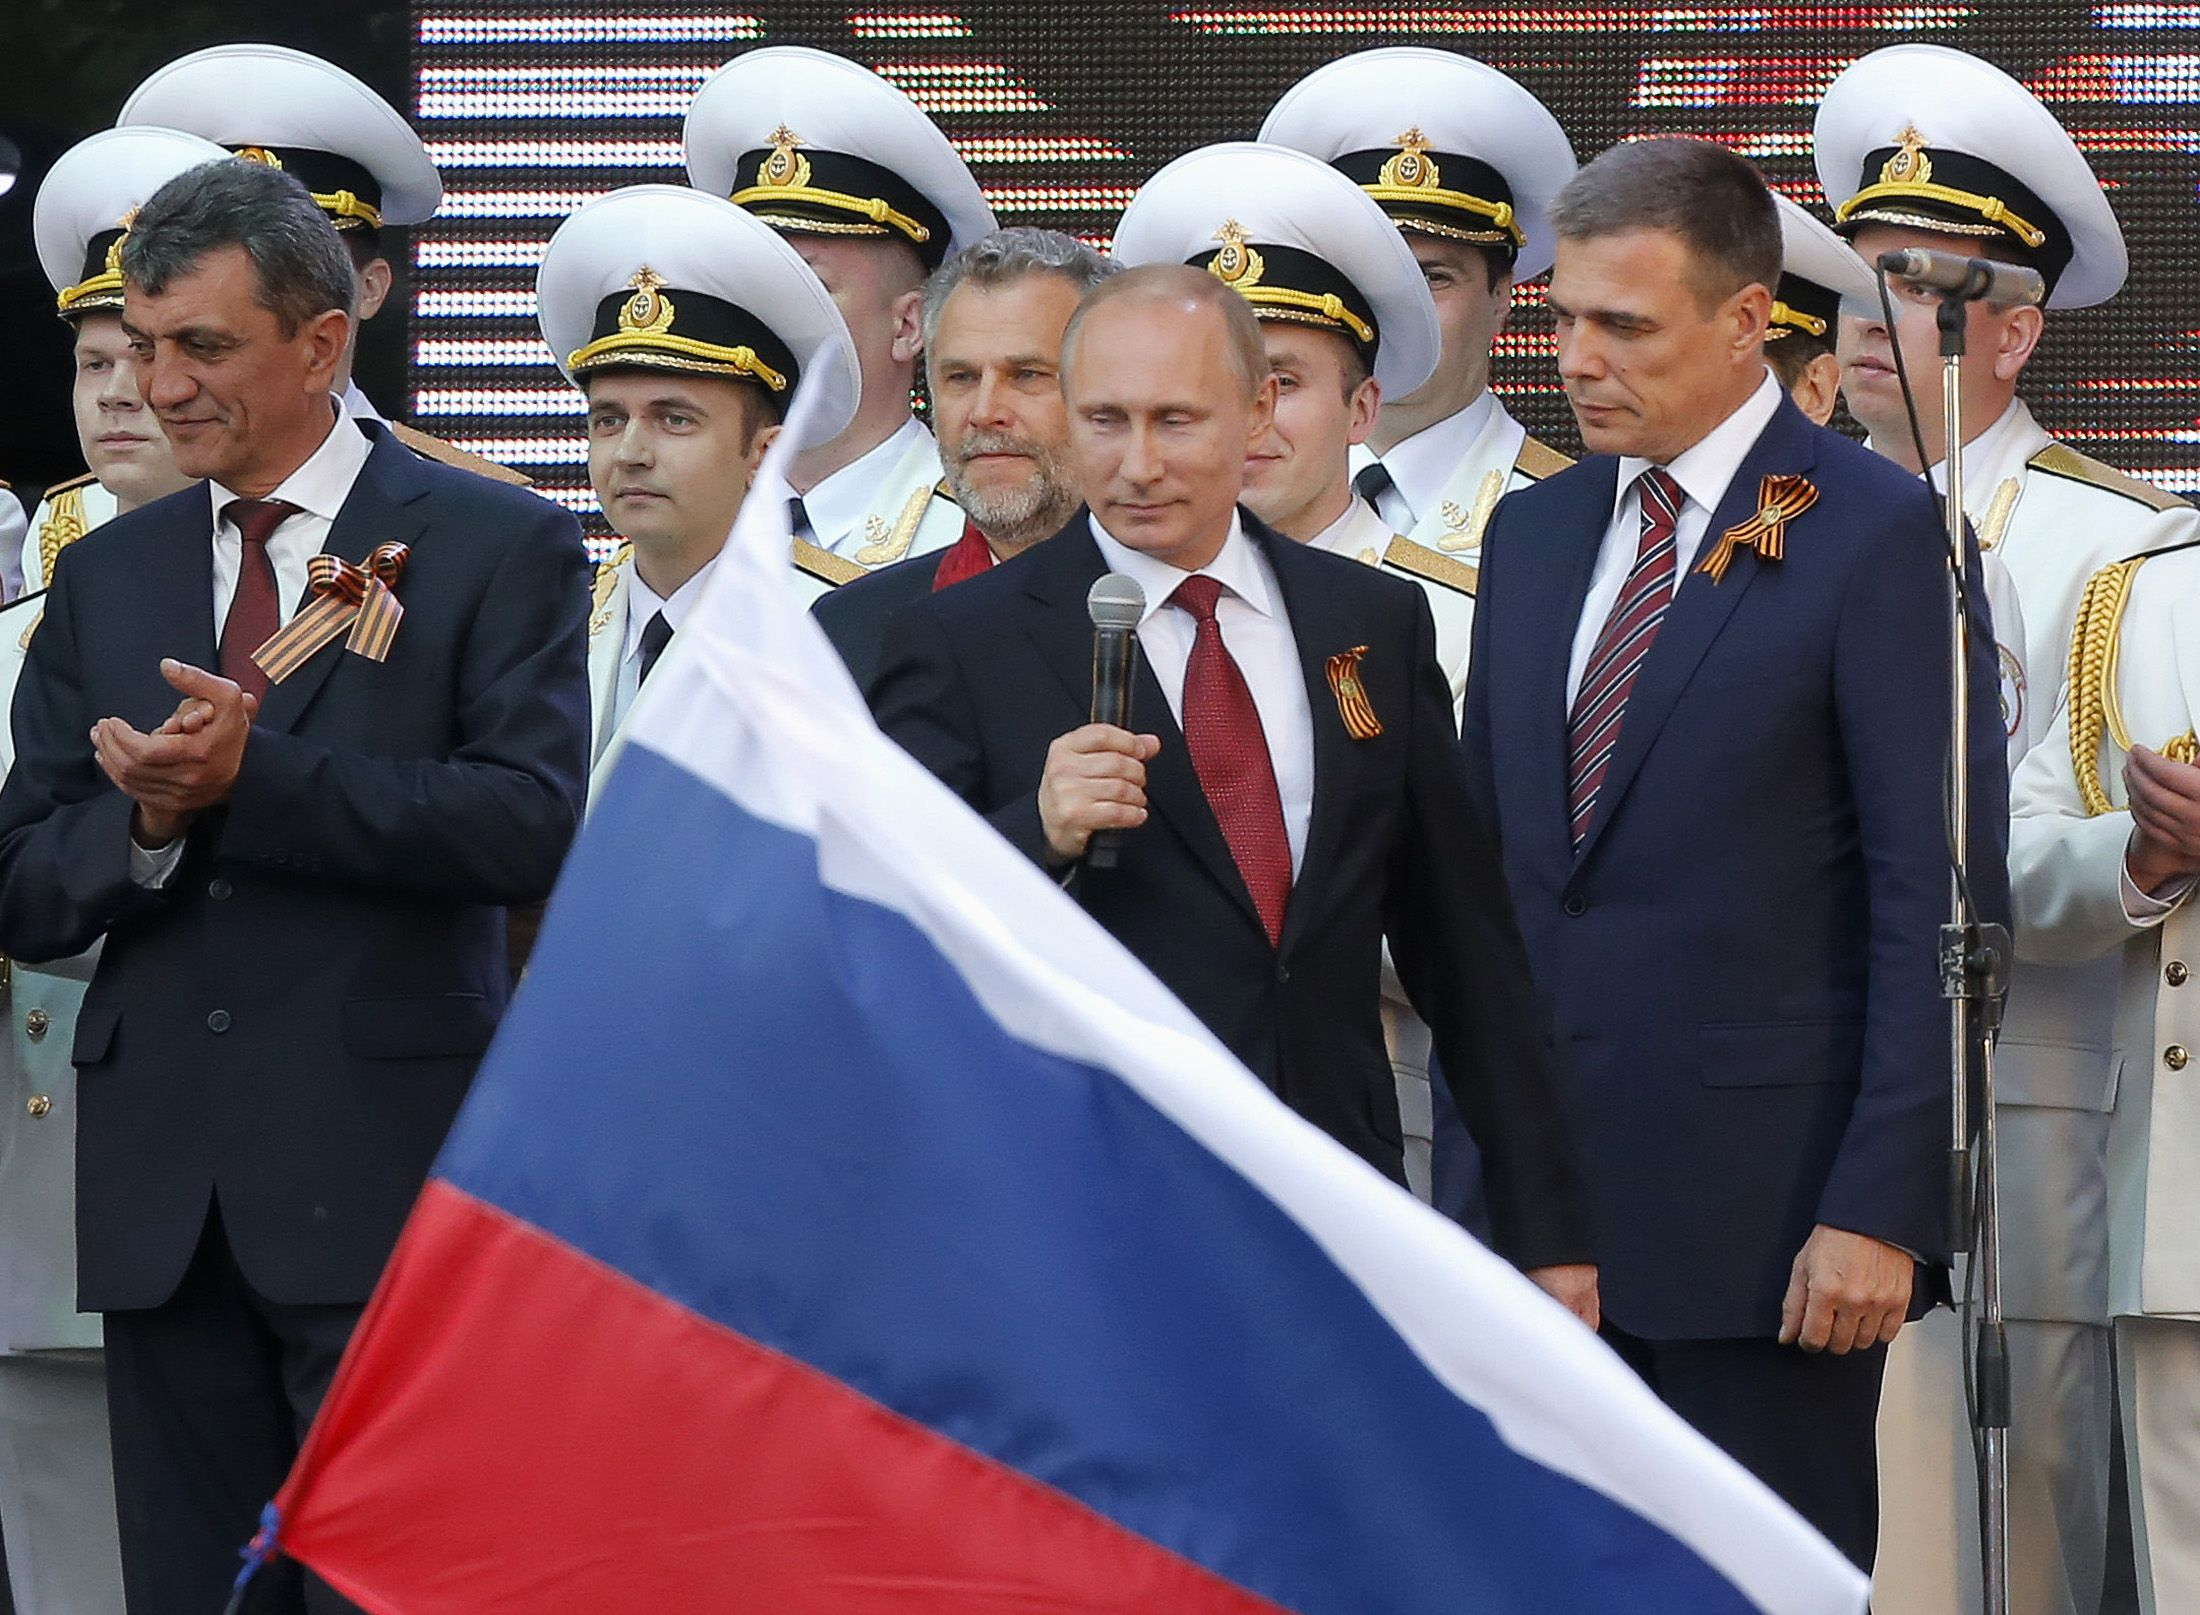 Vladimir Putin in Crimea